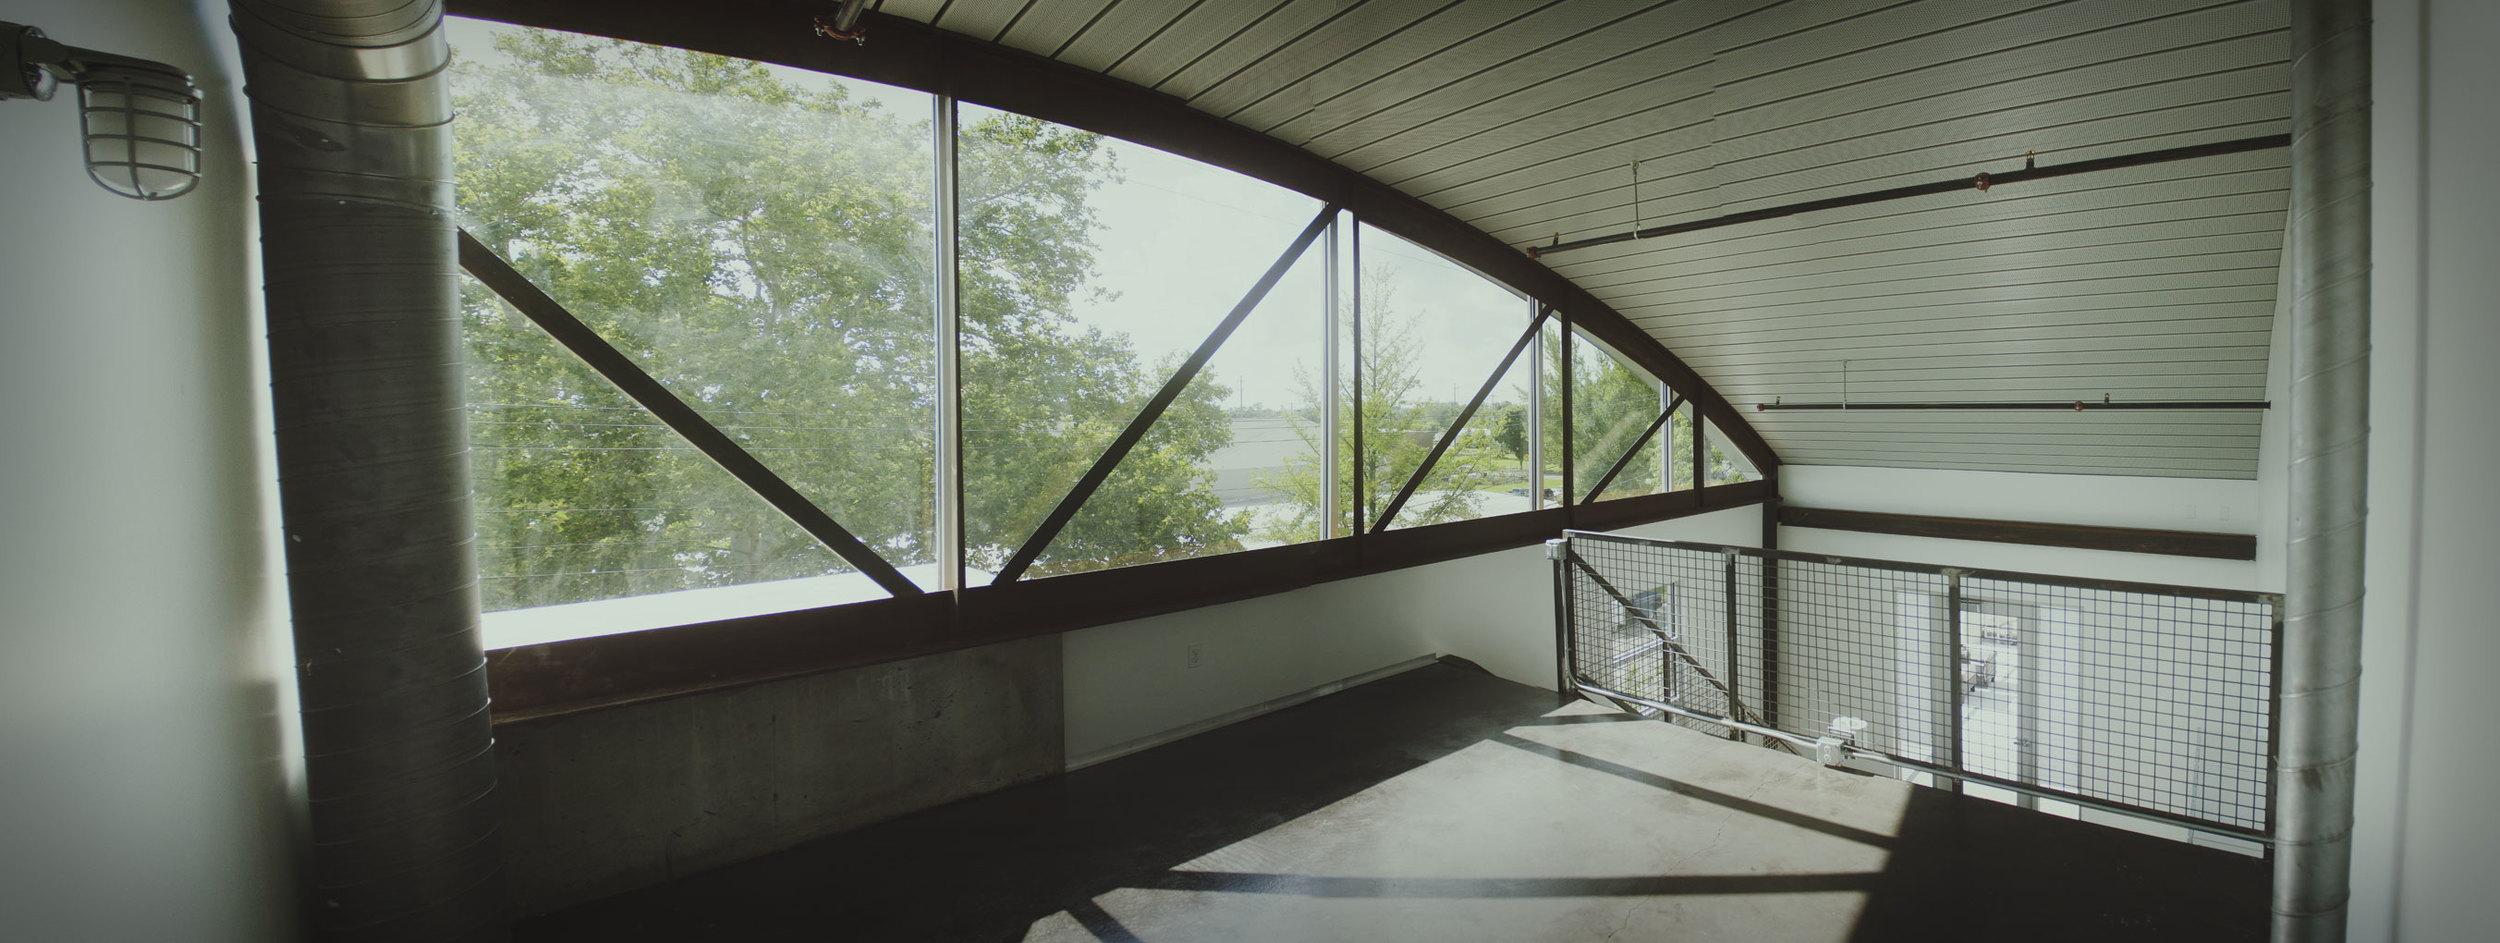 Window-Panorama.jpg